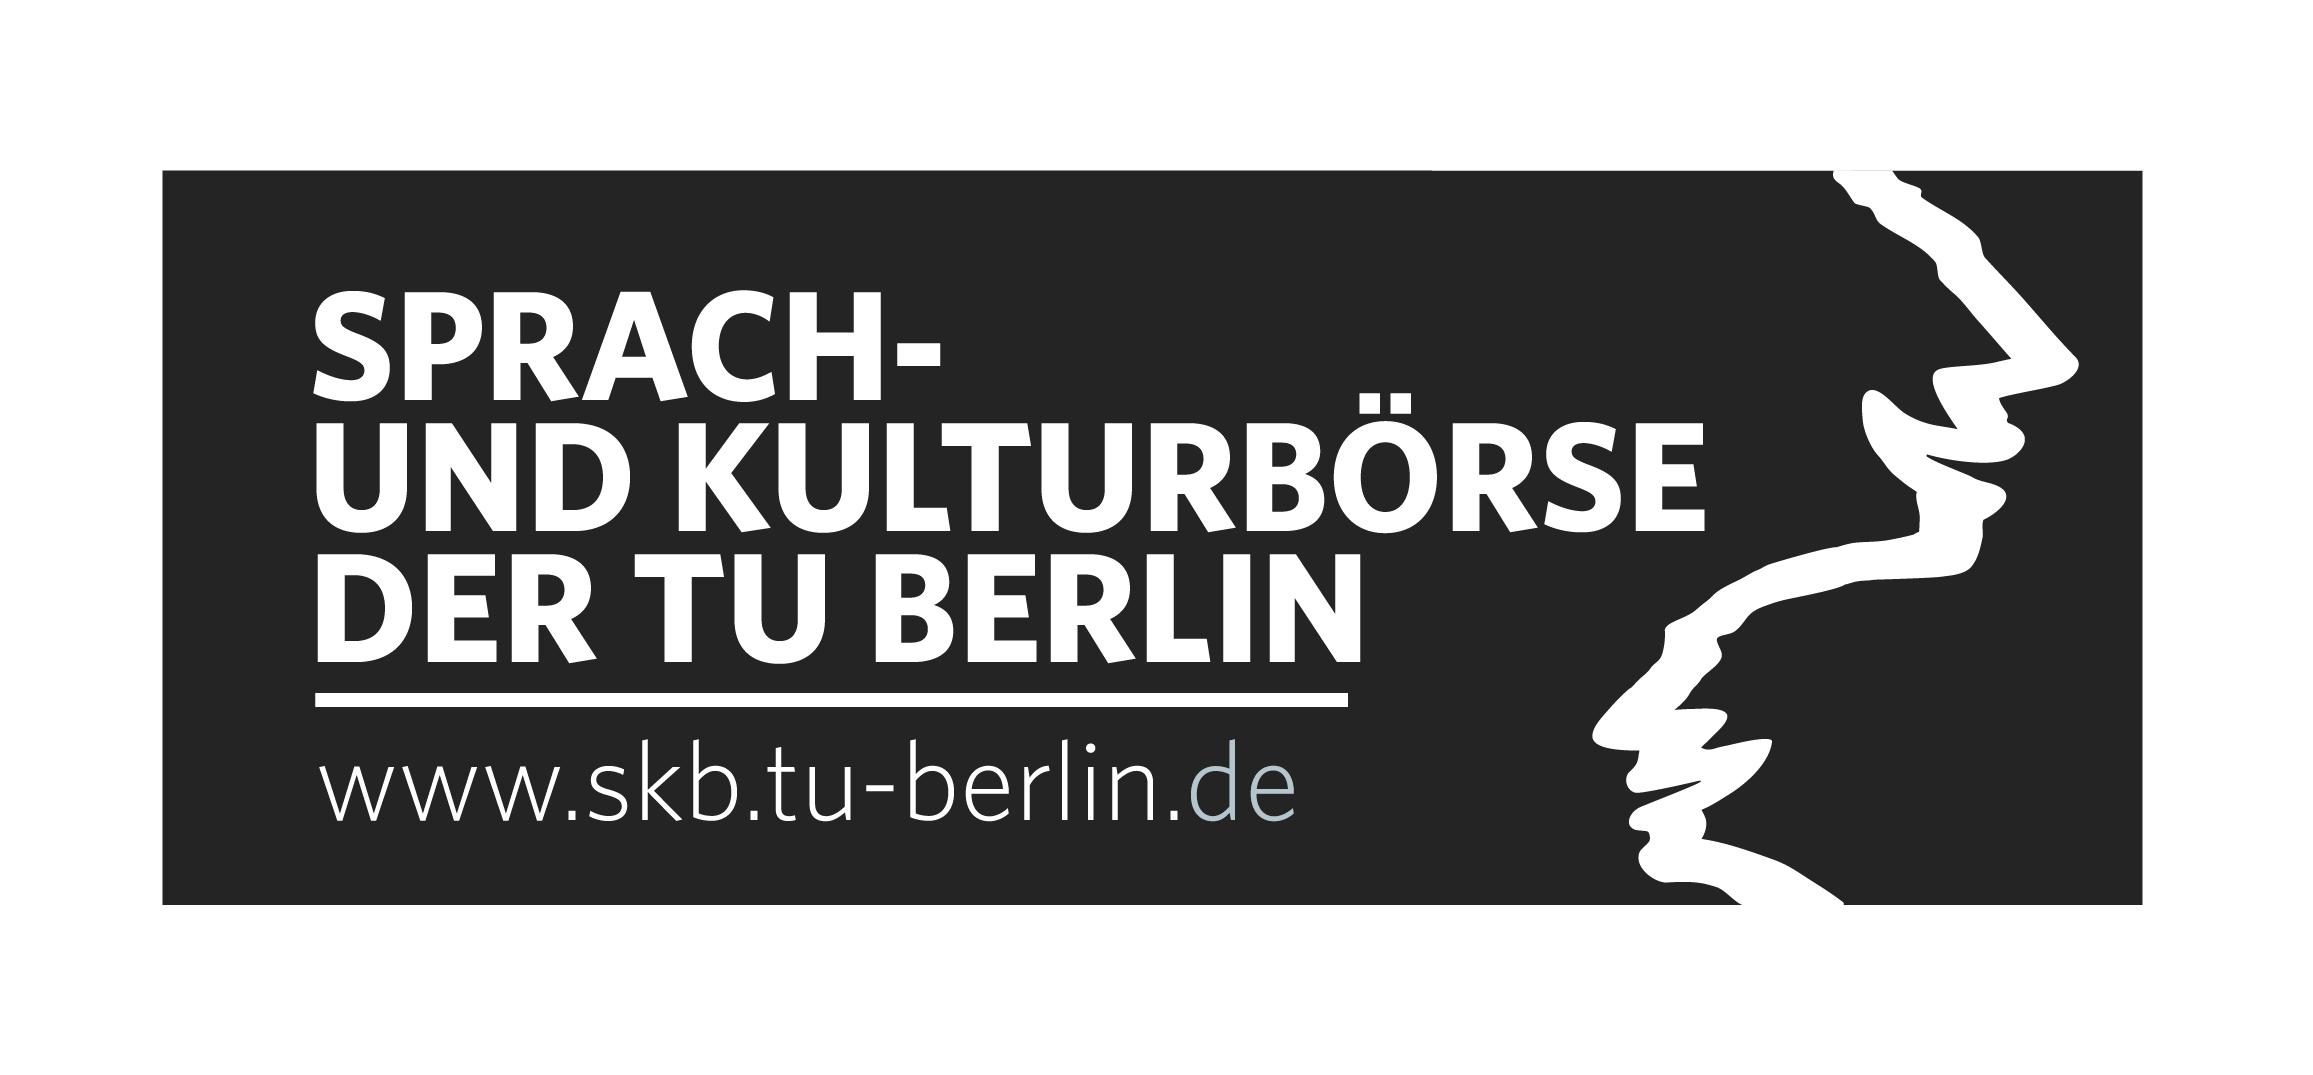 Sprach- und Kulturbörse Berlin